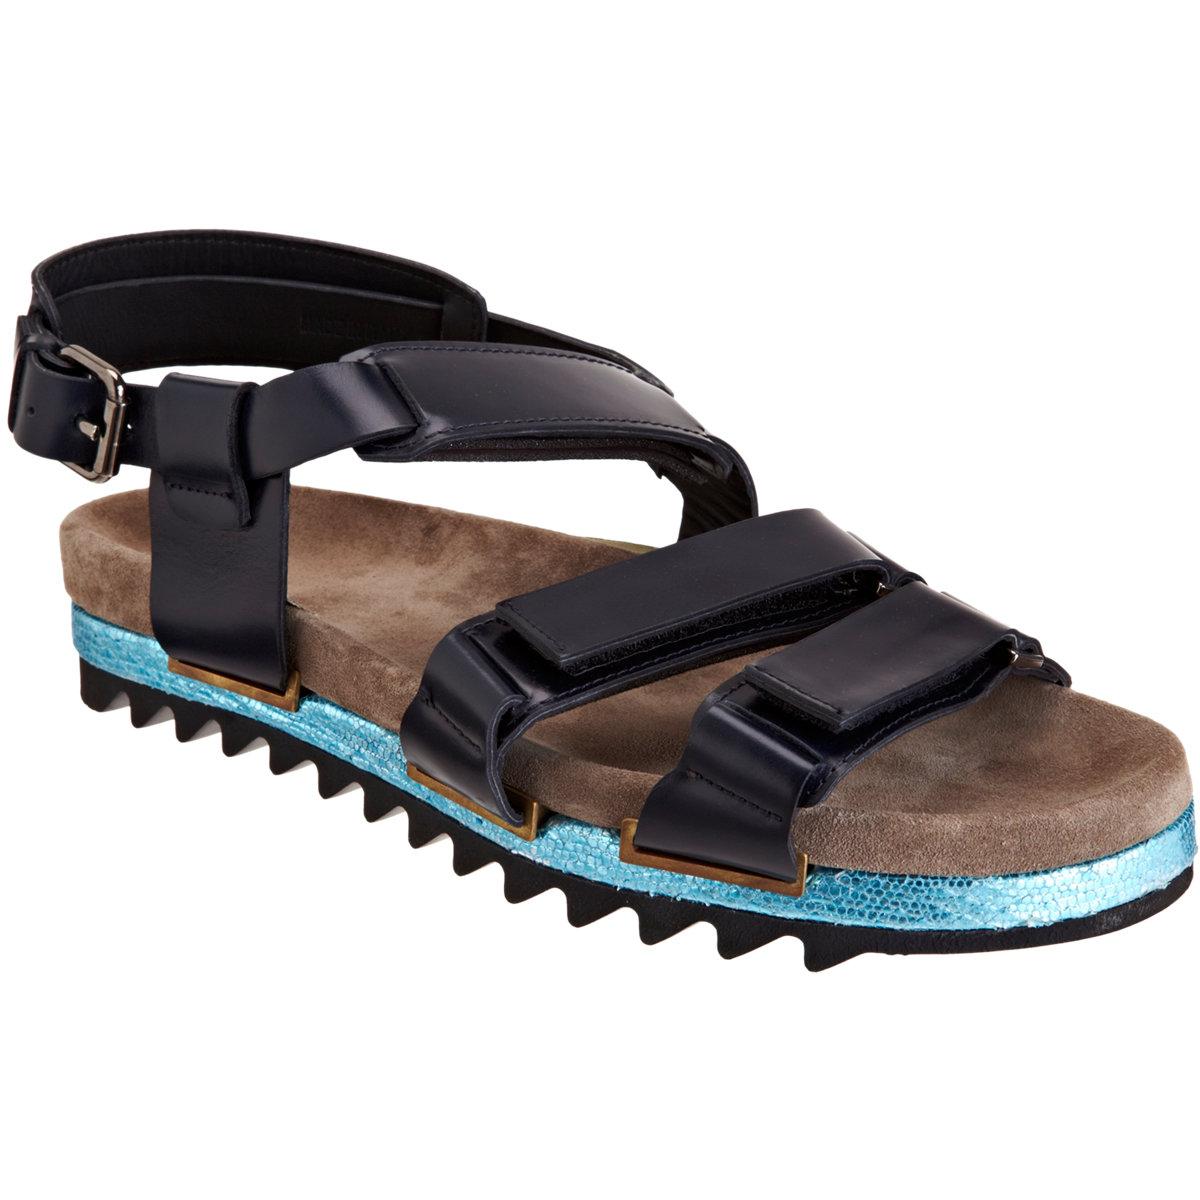 Lanvin Triple Strap Sandal In Blue For Men Lyst